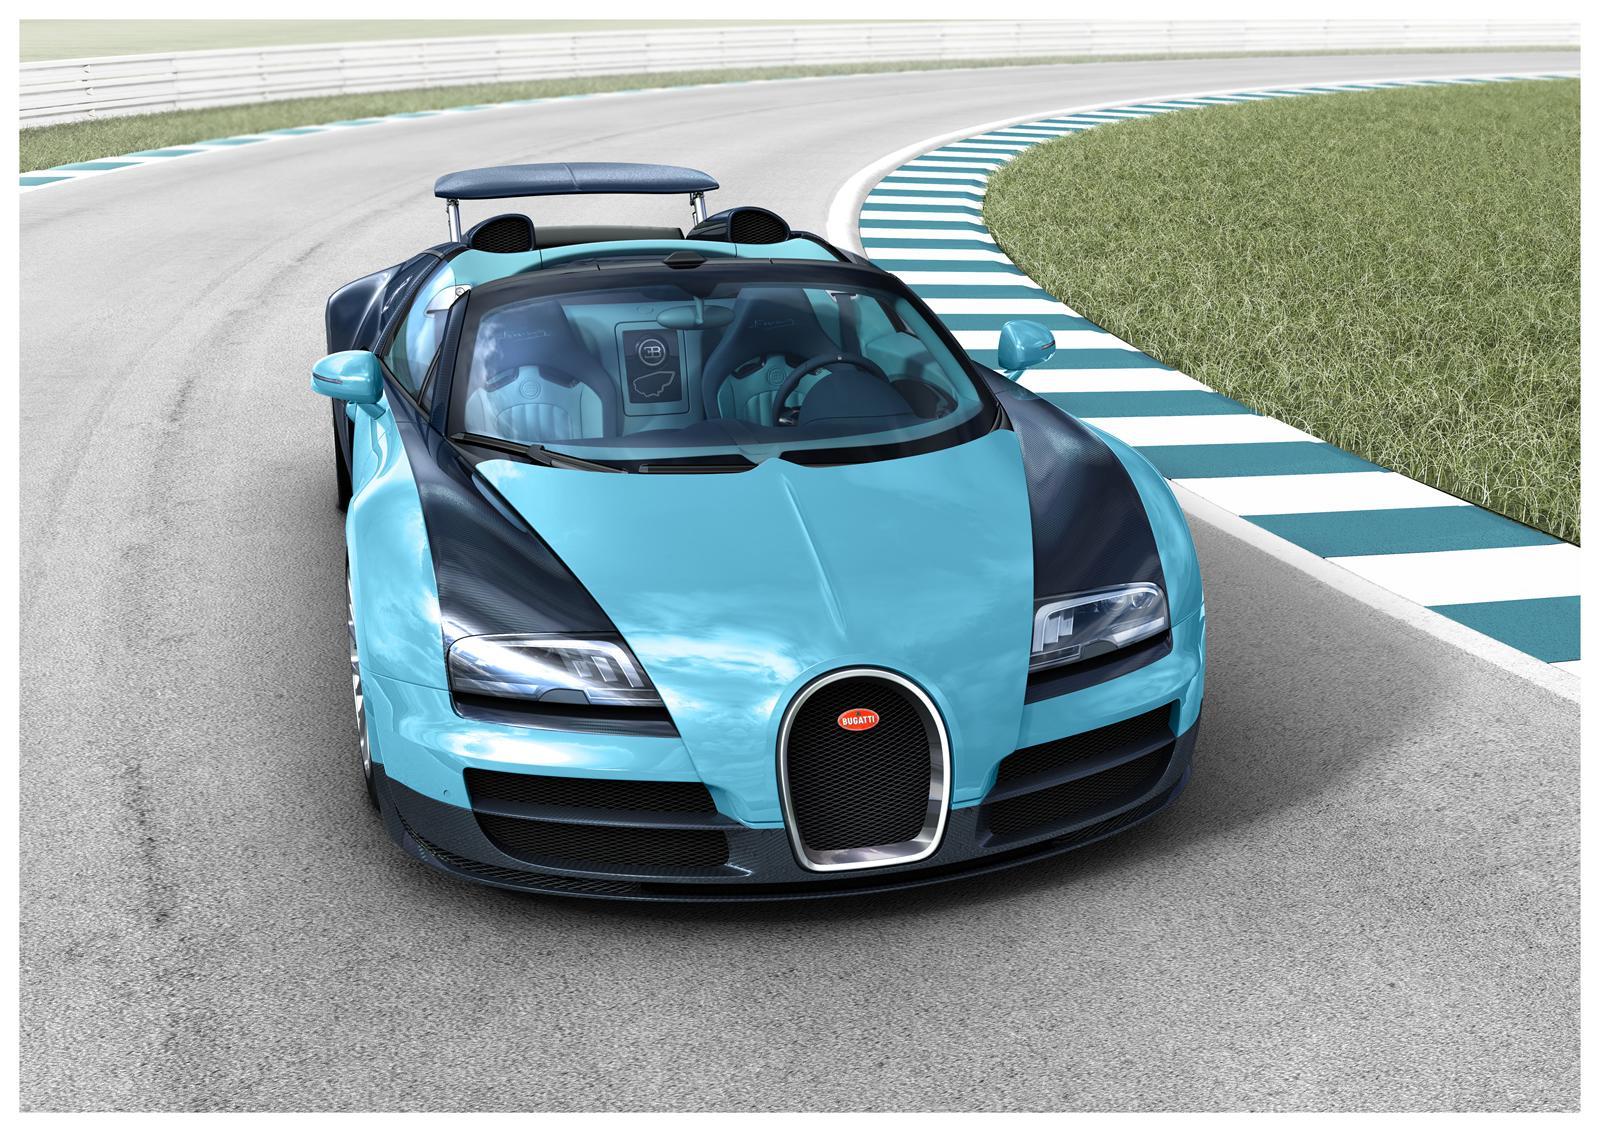 Bugatti Launches New Limited Edition Veyron Autoevolution